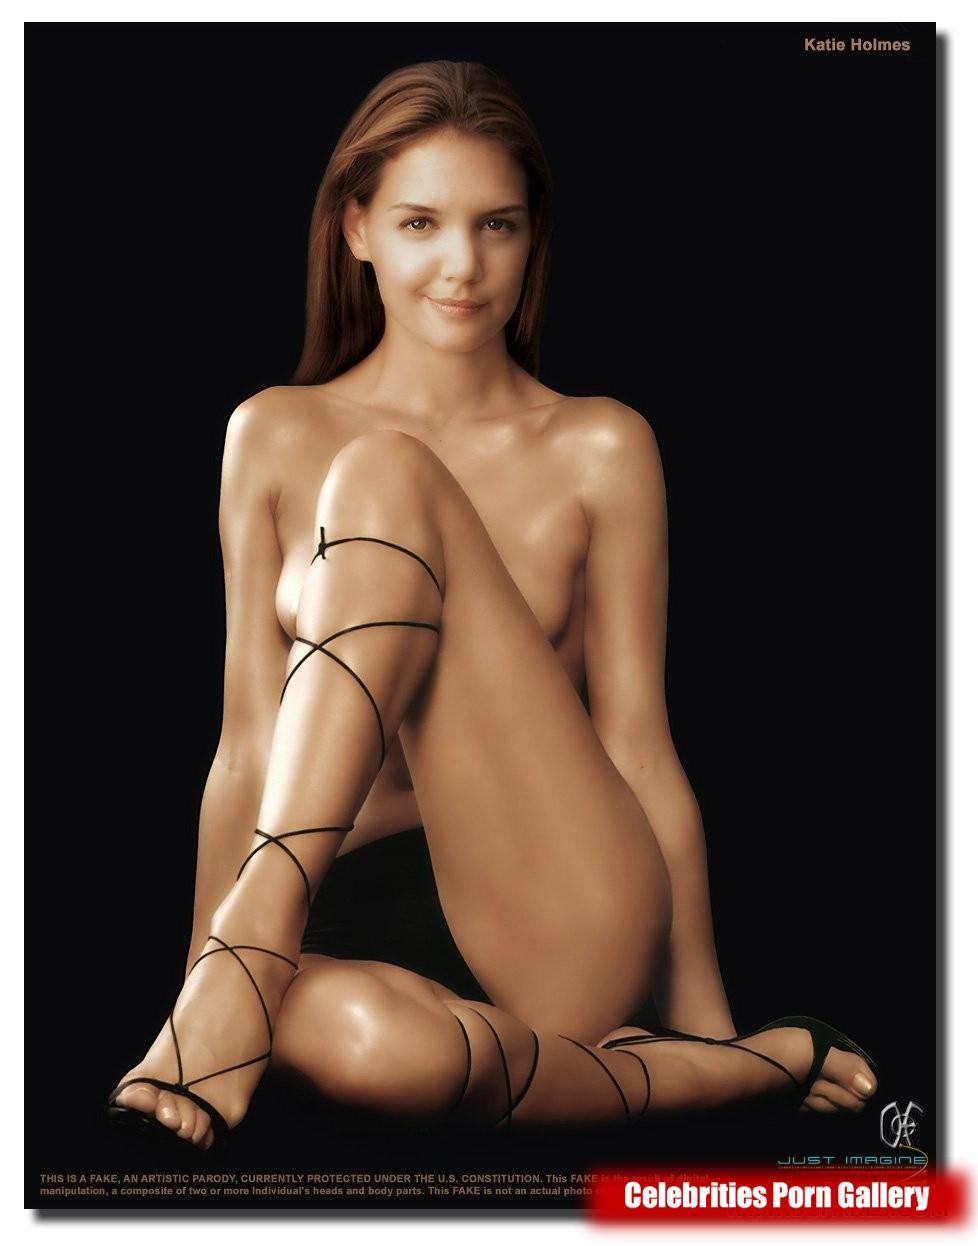 Katie holmes hot naked celebs